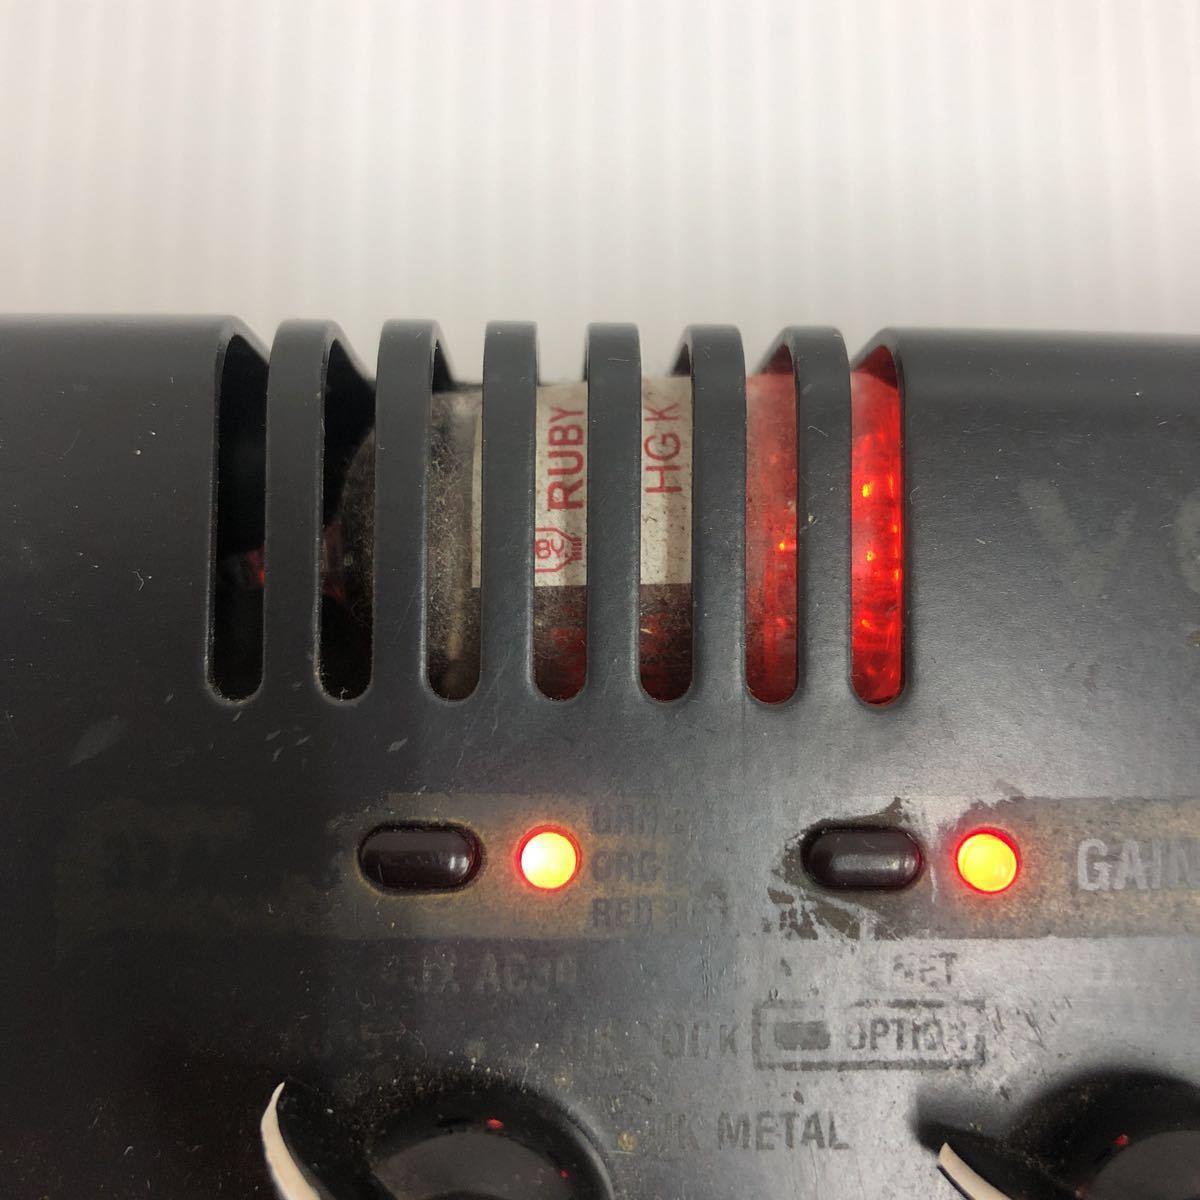 VOX ヴォックス マルチエフェクター 真空管搭載 TONELAB ST 1円スタート 通電のみ確認 ジャンク_画像2